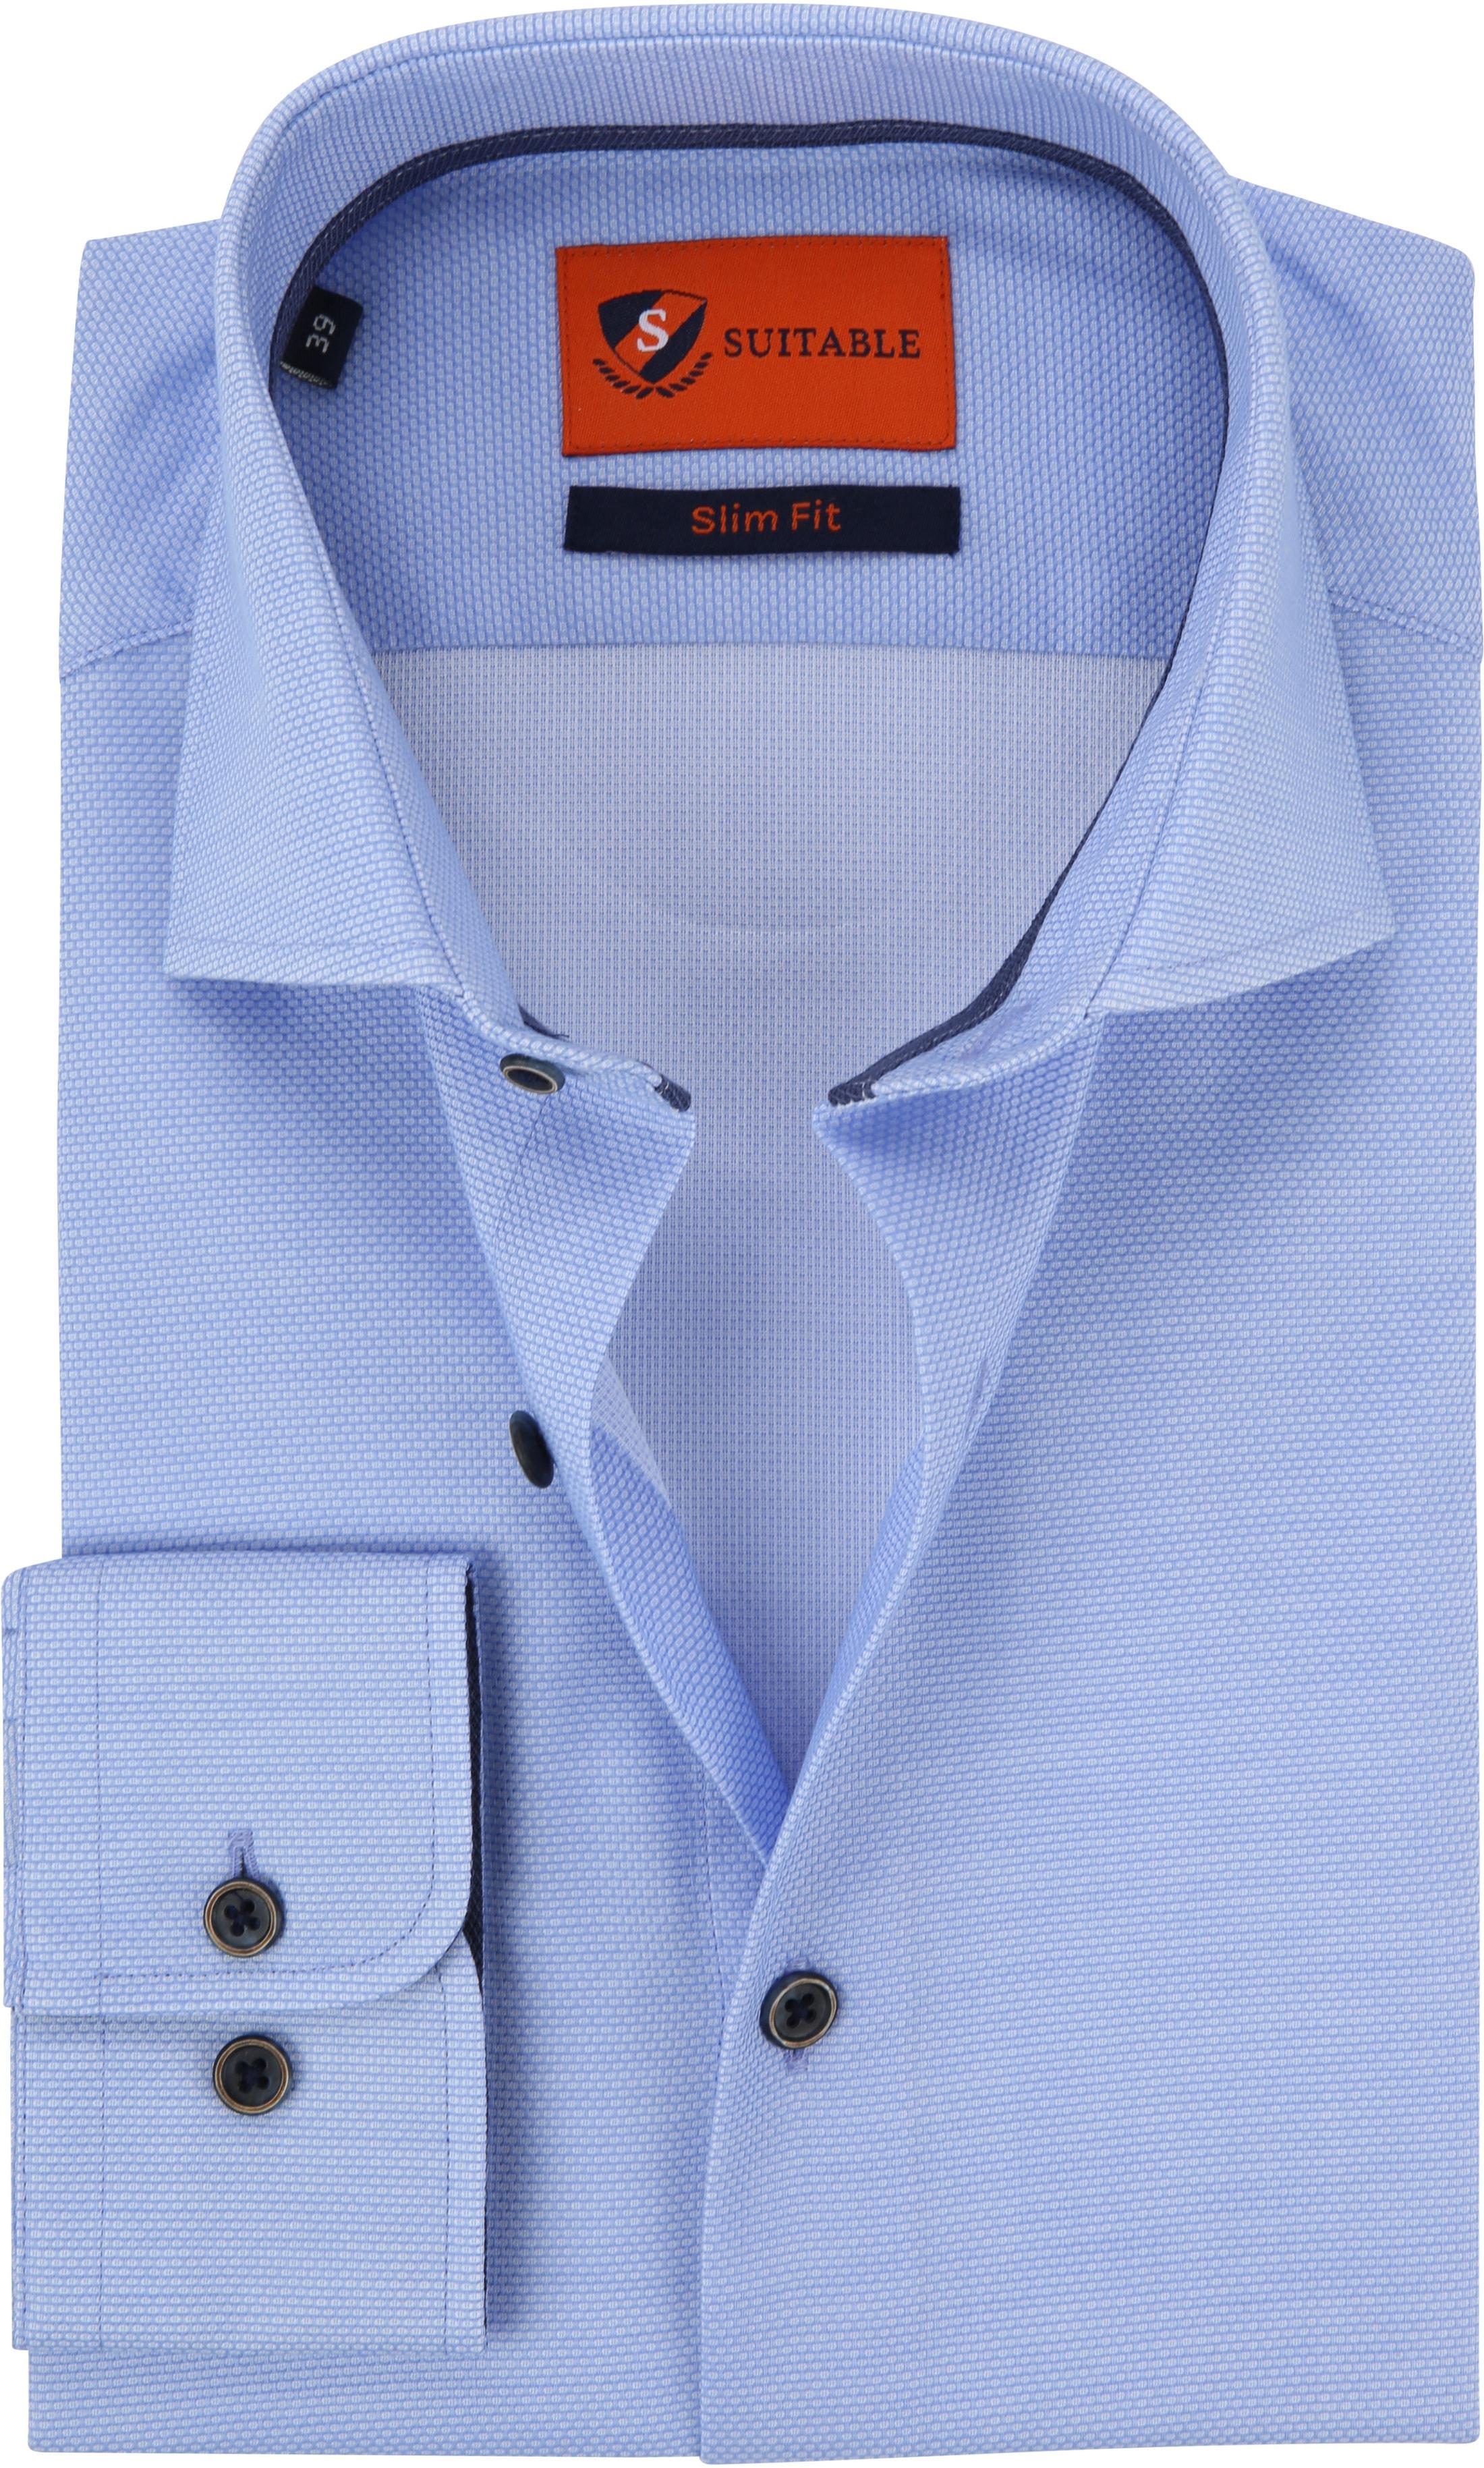 Suitable Overhemd Lichtblauw Waut foto 0